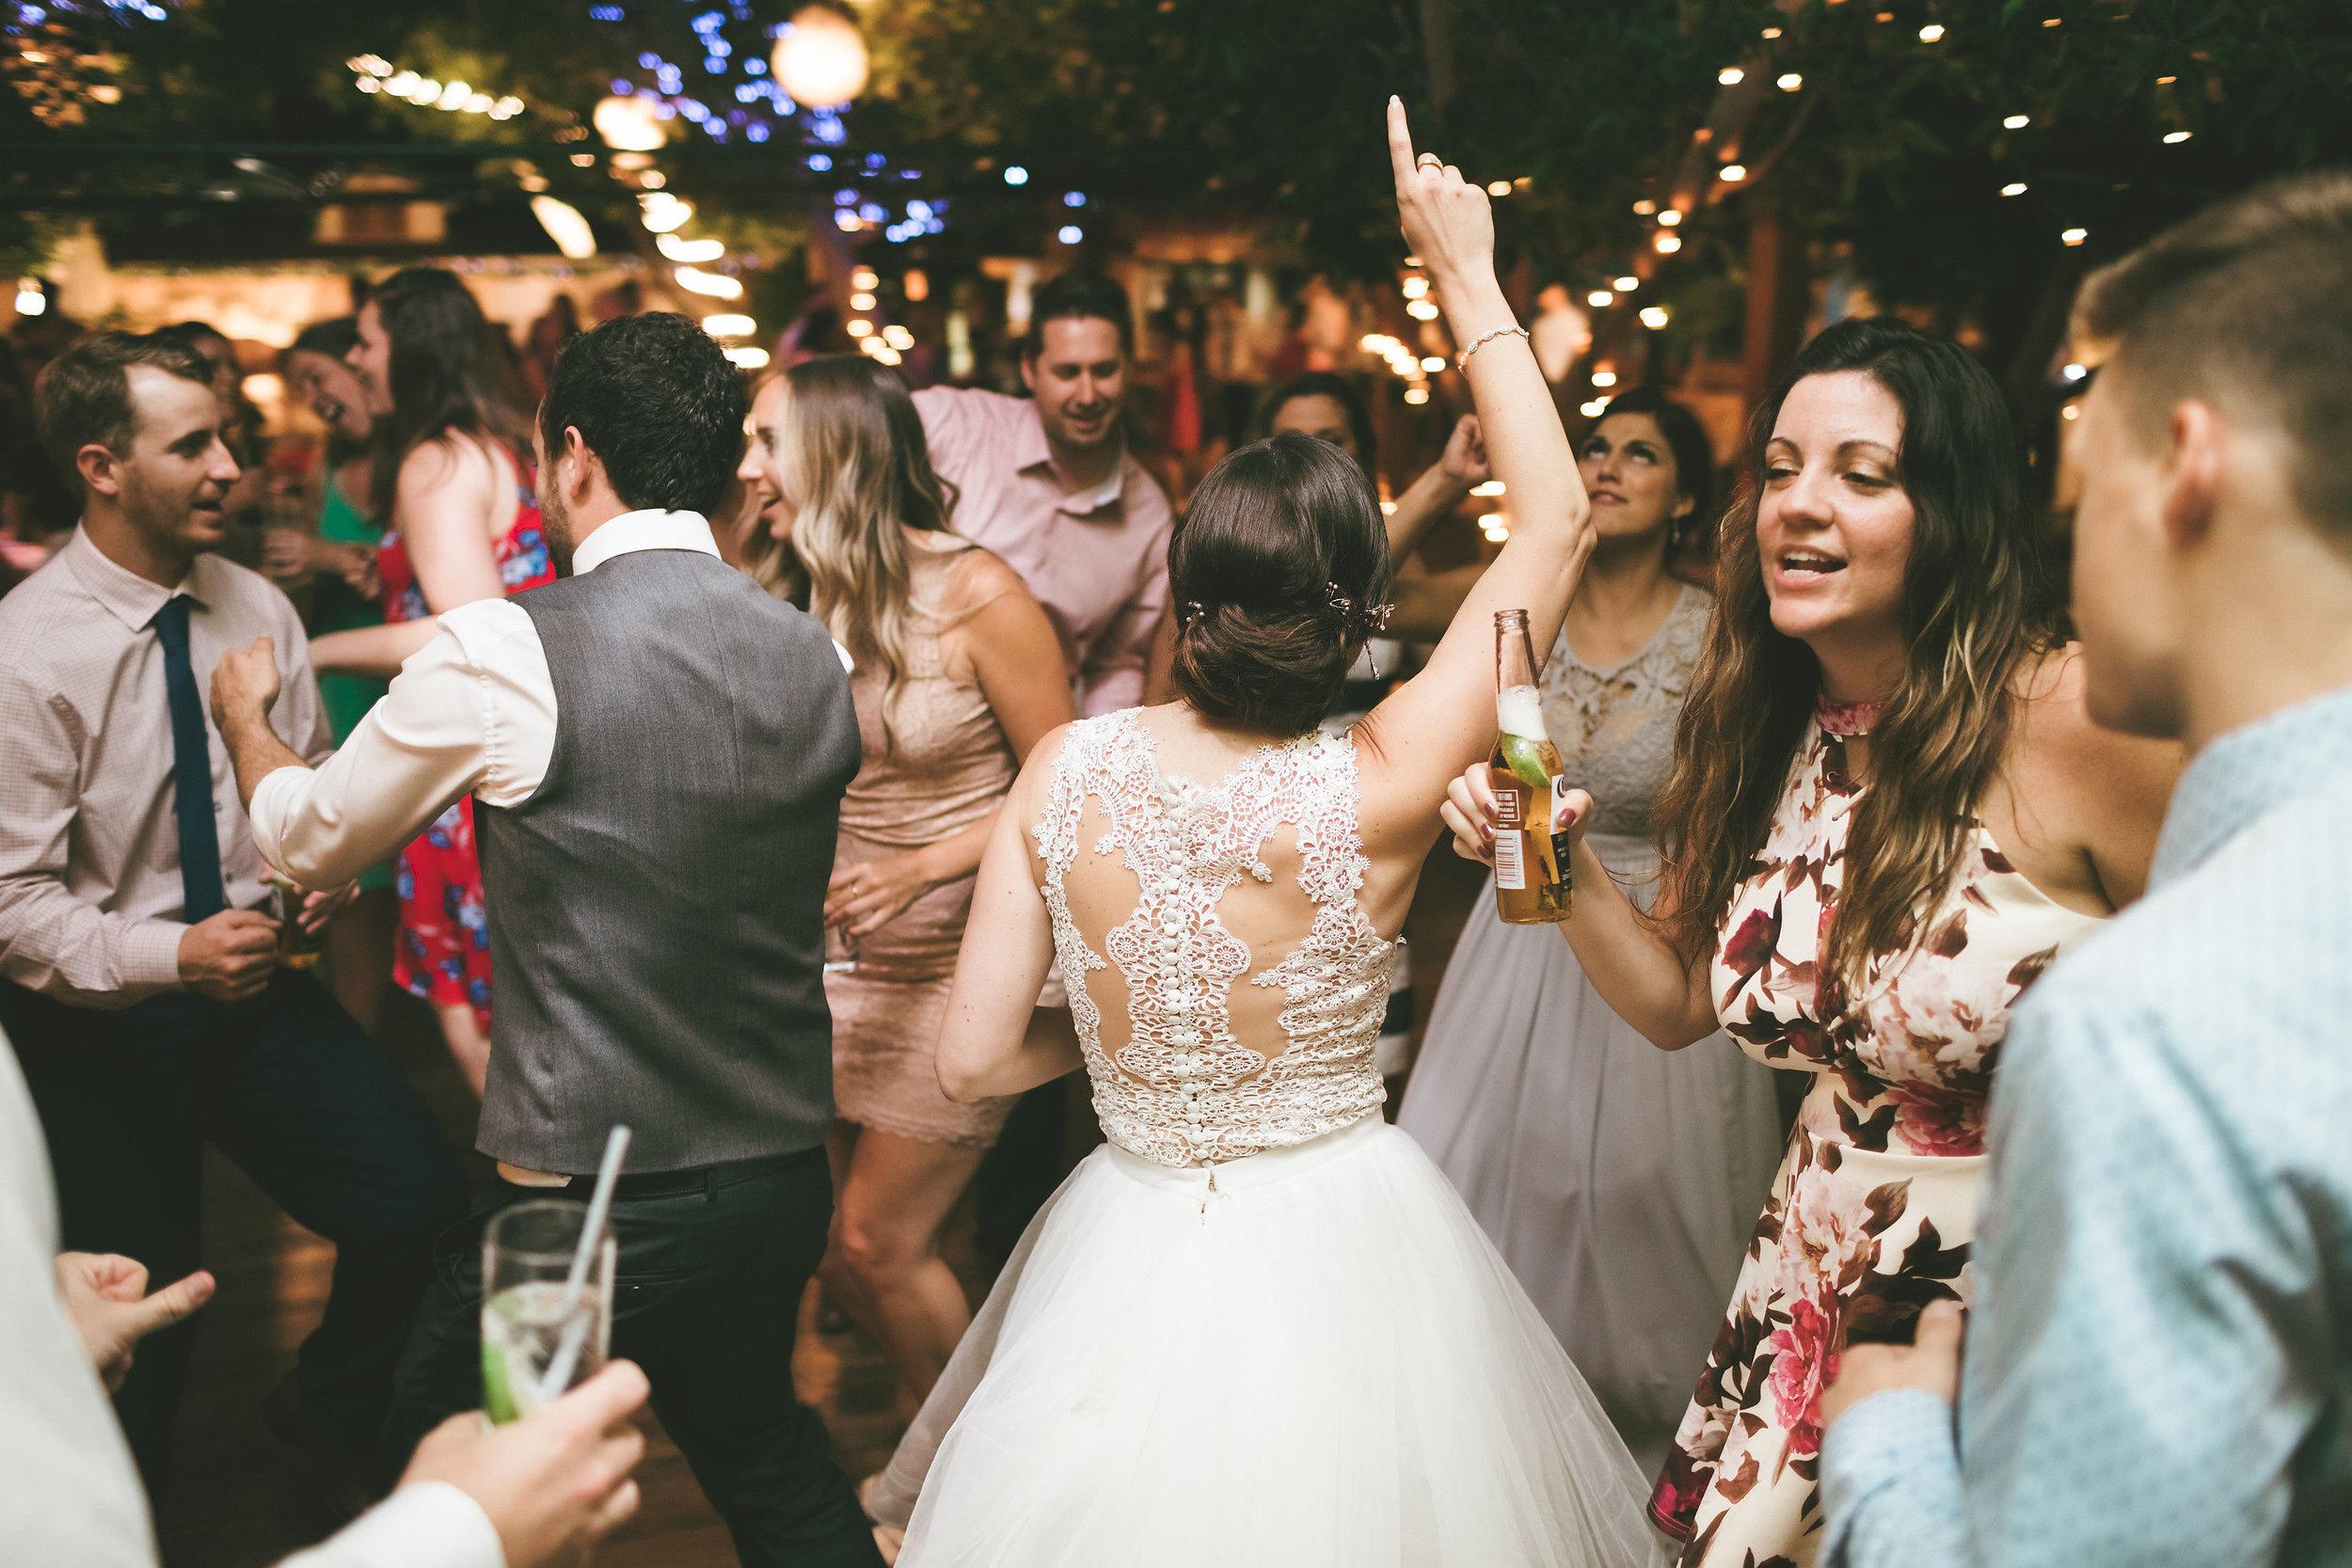 gosia___mike_wedding___lifesreel_danielcaruso___1710.jpg